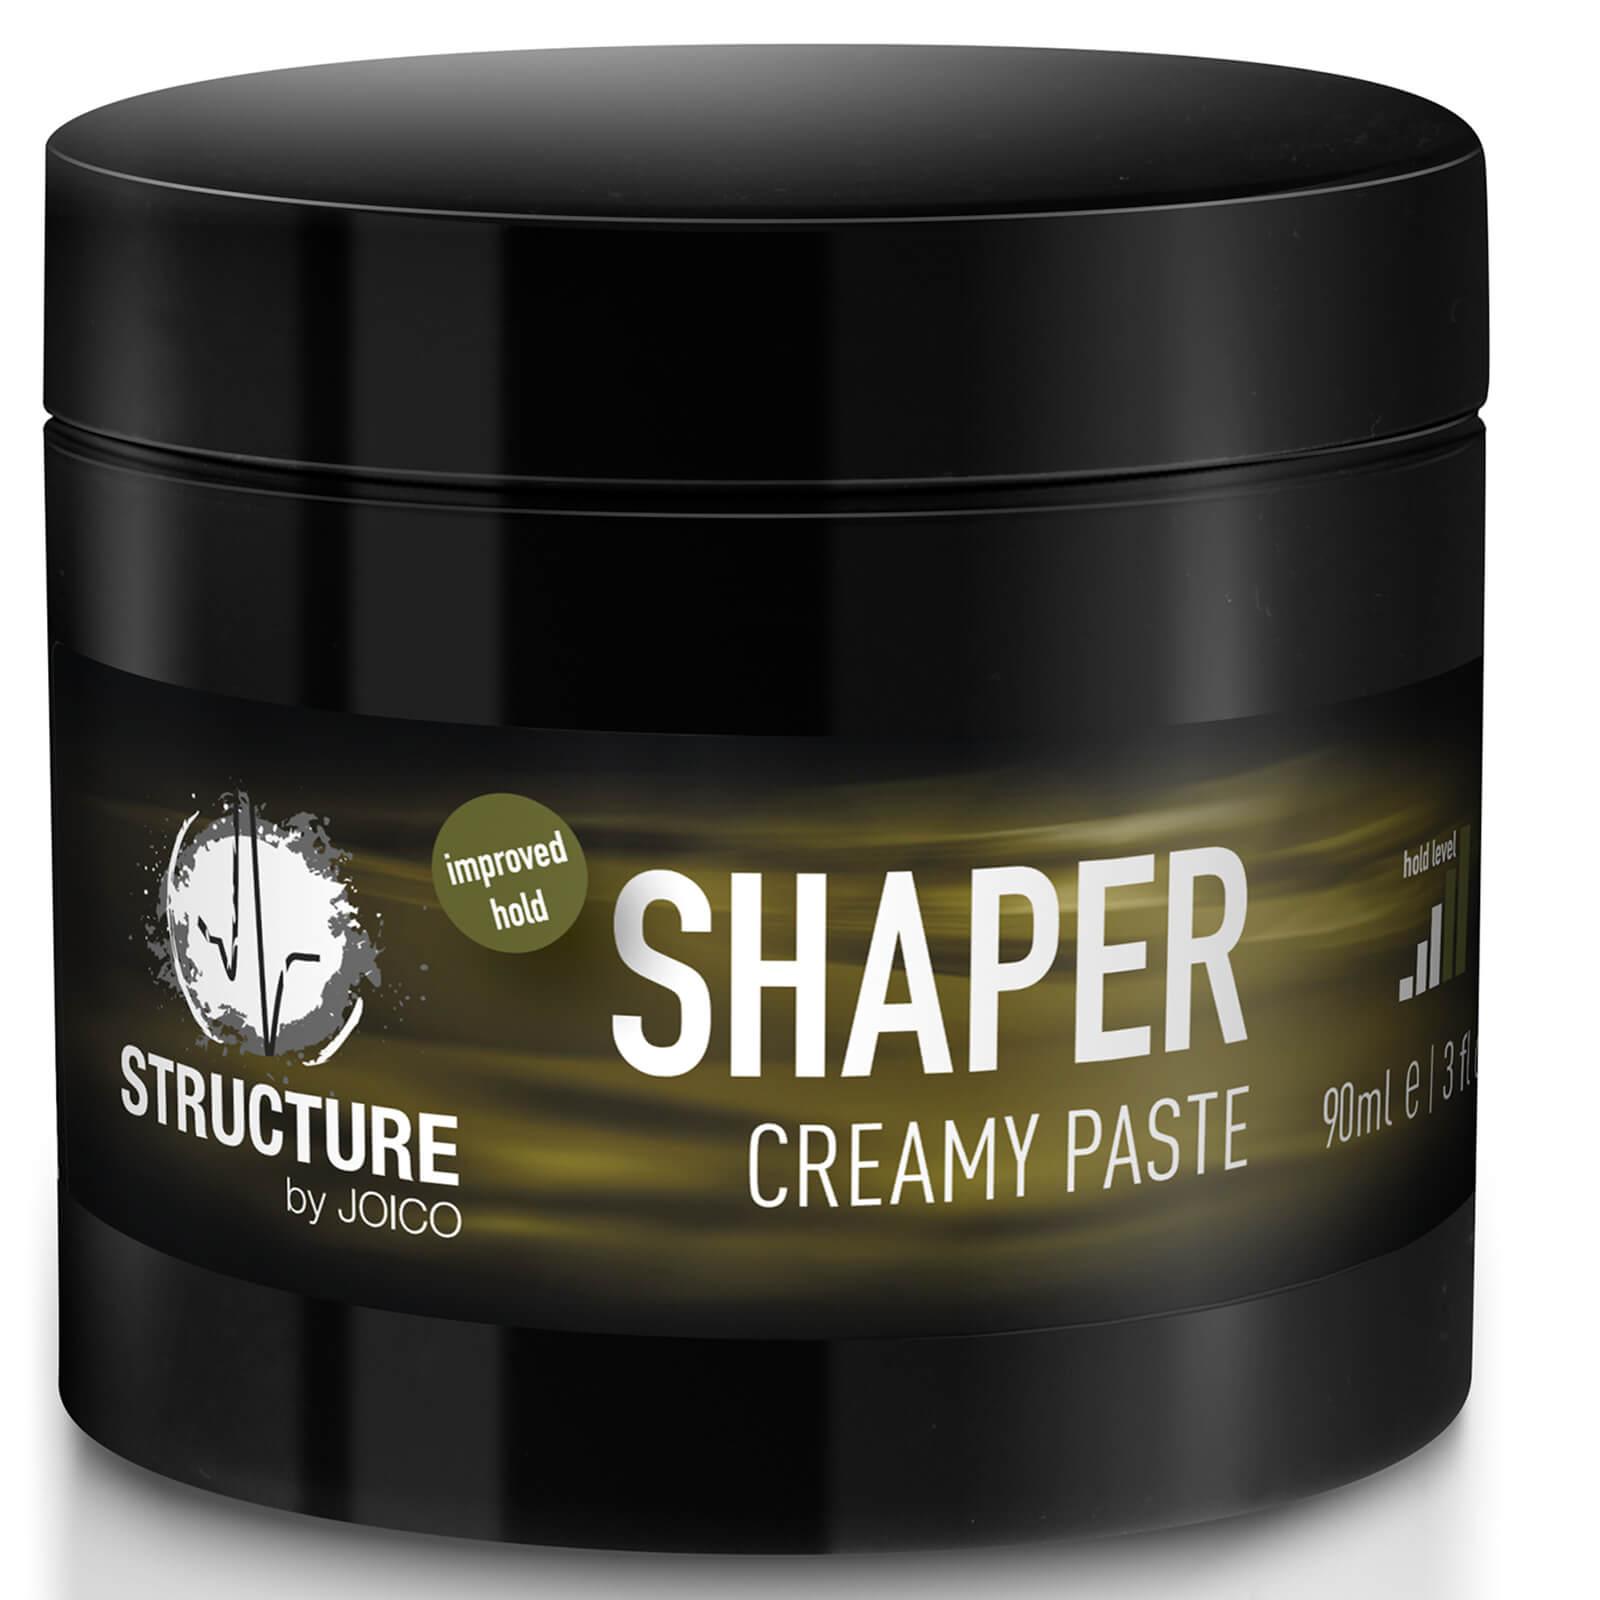 Shaper Creamy Paste